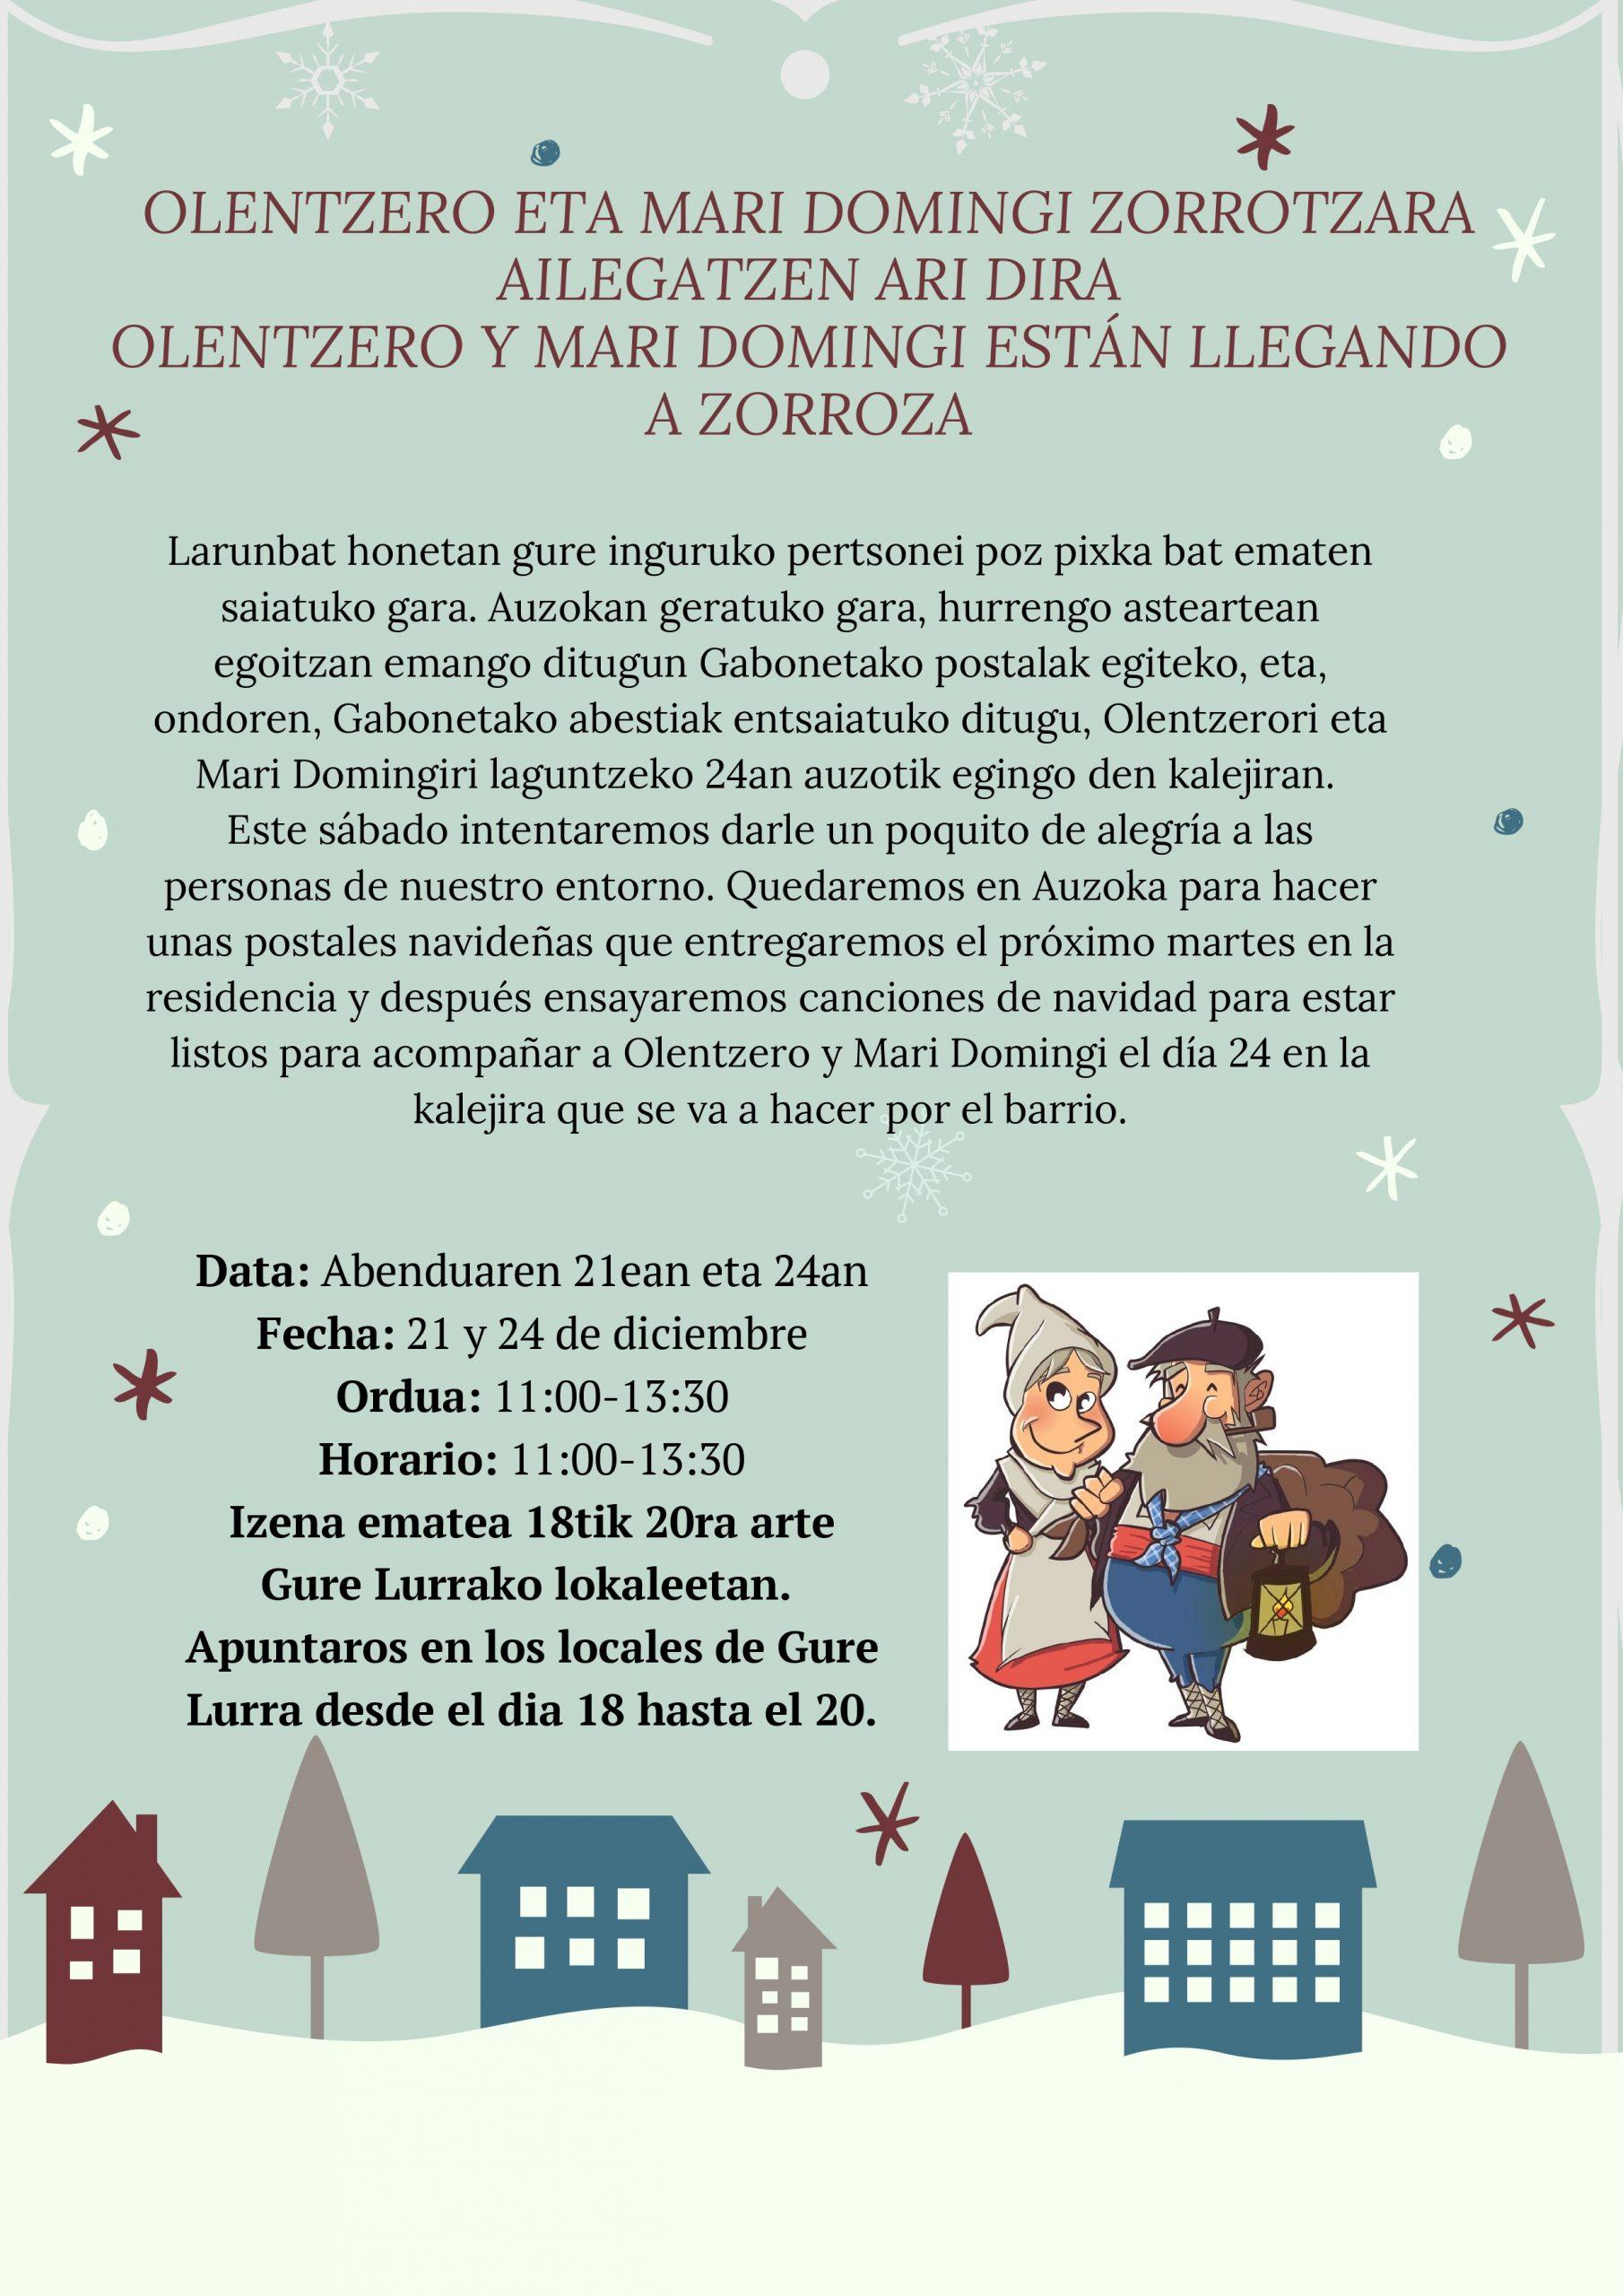 ¡Olentzero y Mari Domingi camino a Zorroza!